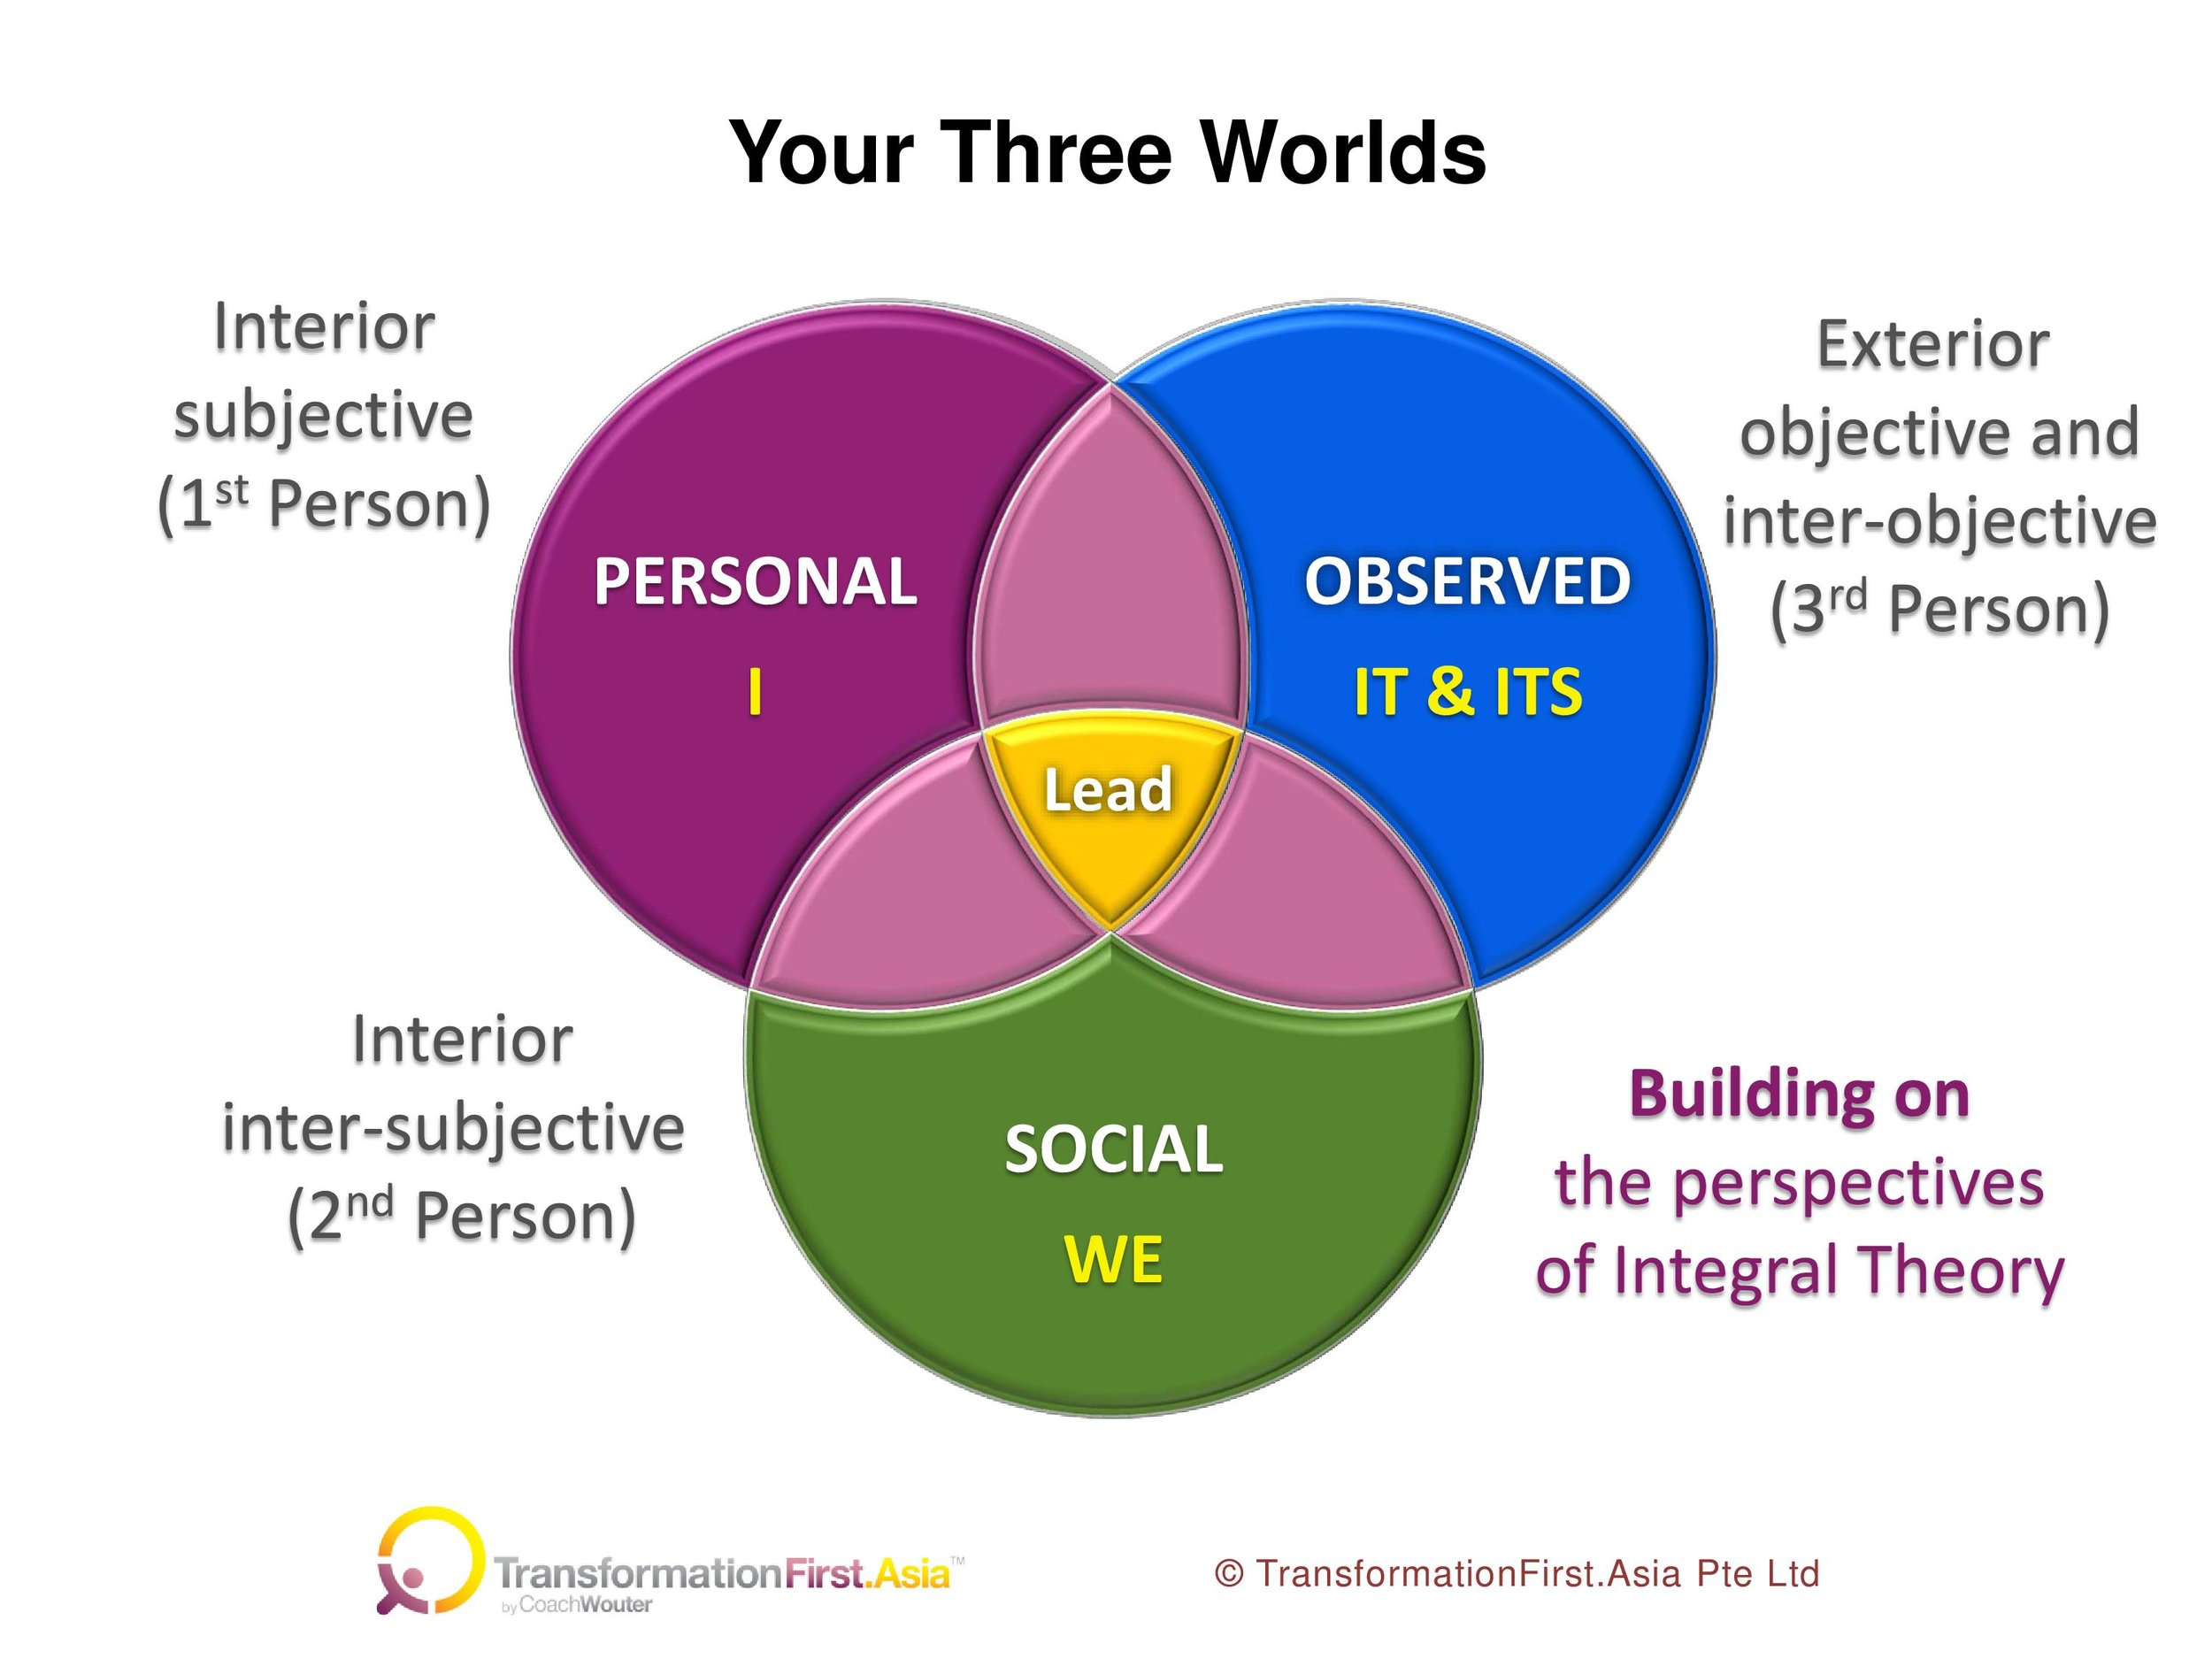 Your Three Worlds Model 11 April 2018.jpg